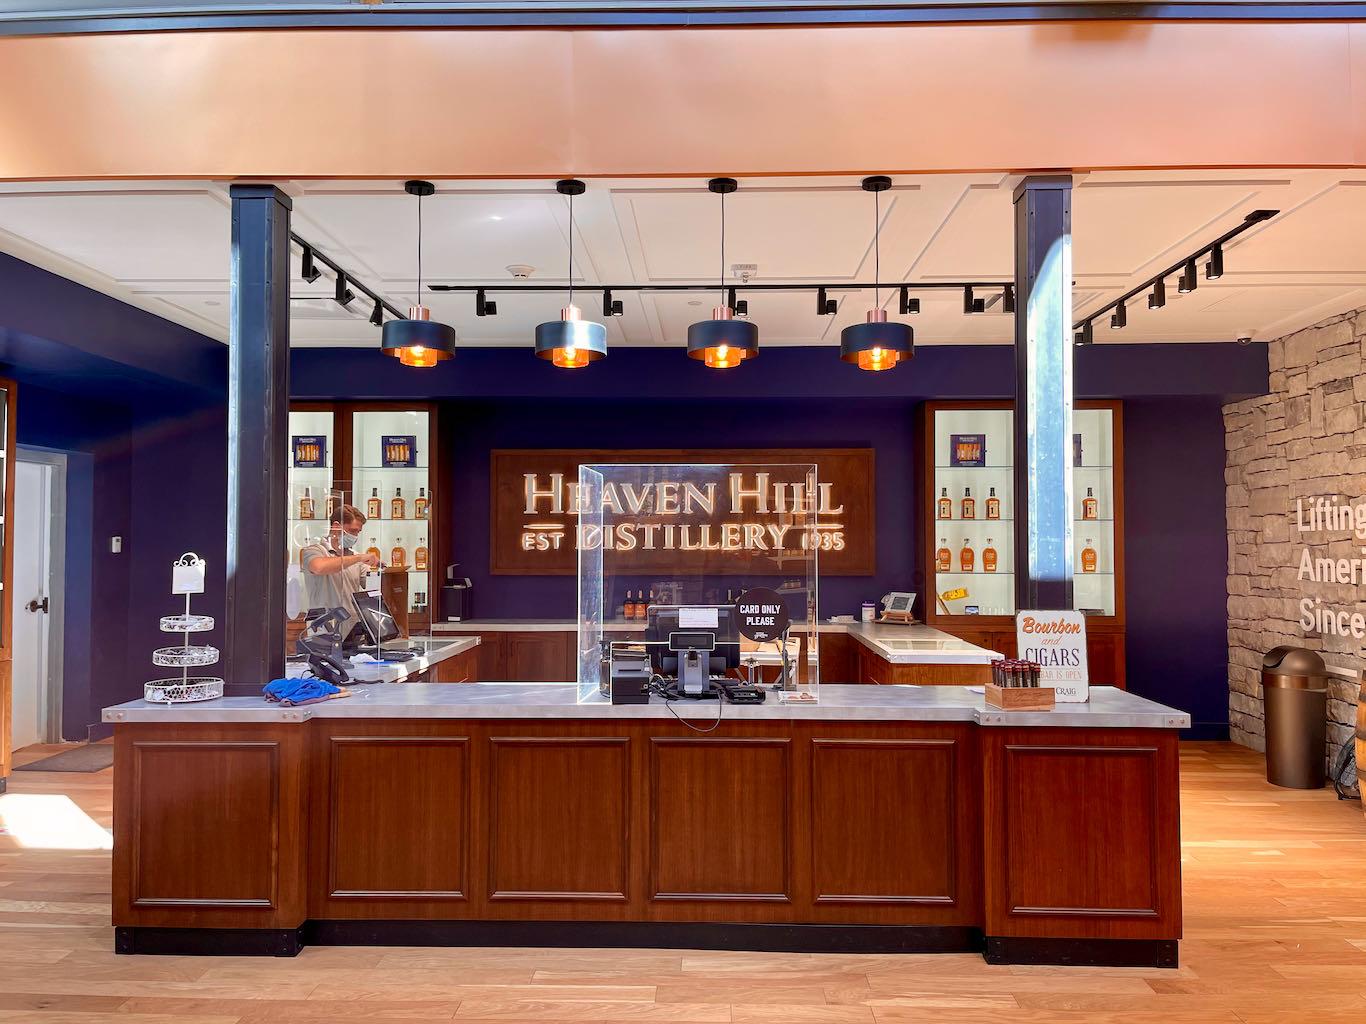 Heaven Hill Distillery Bourbon Heritage Center  Gift Shop